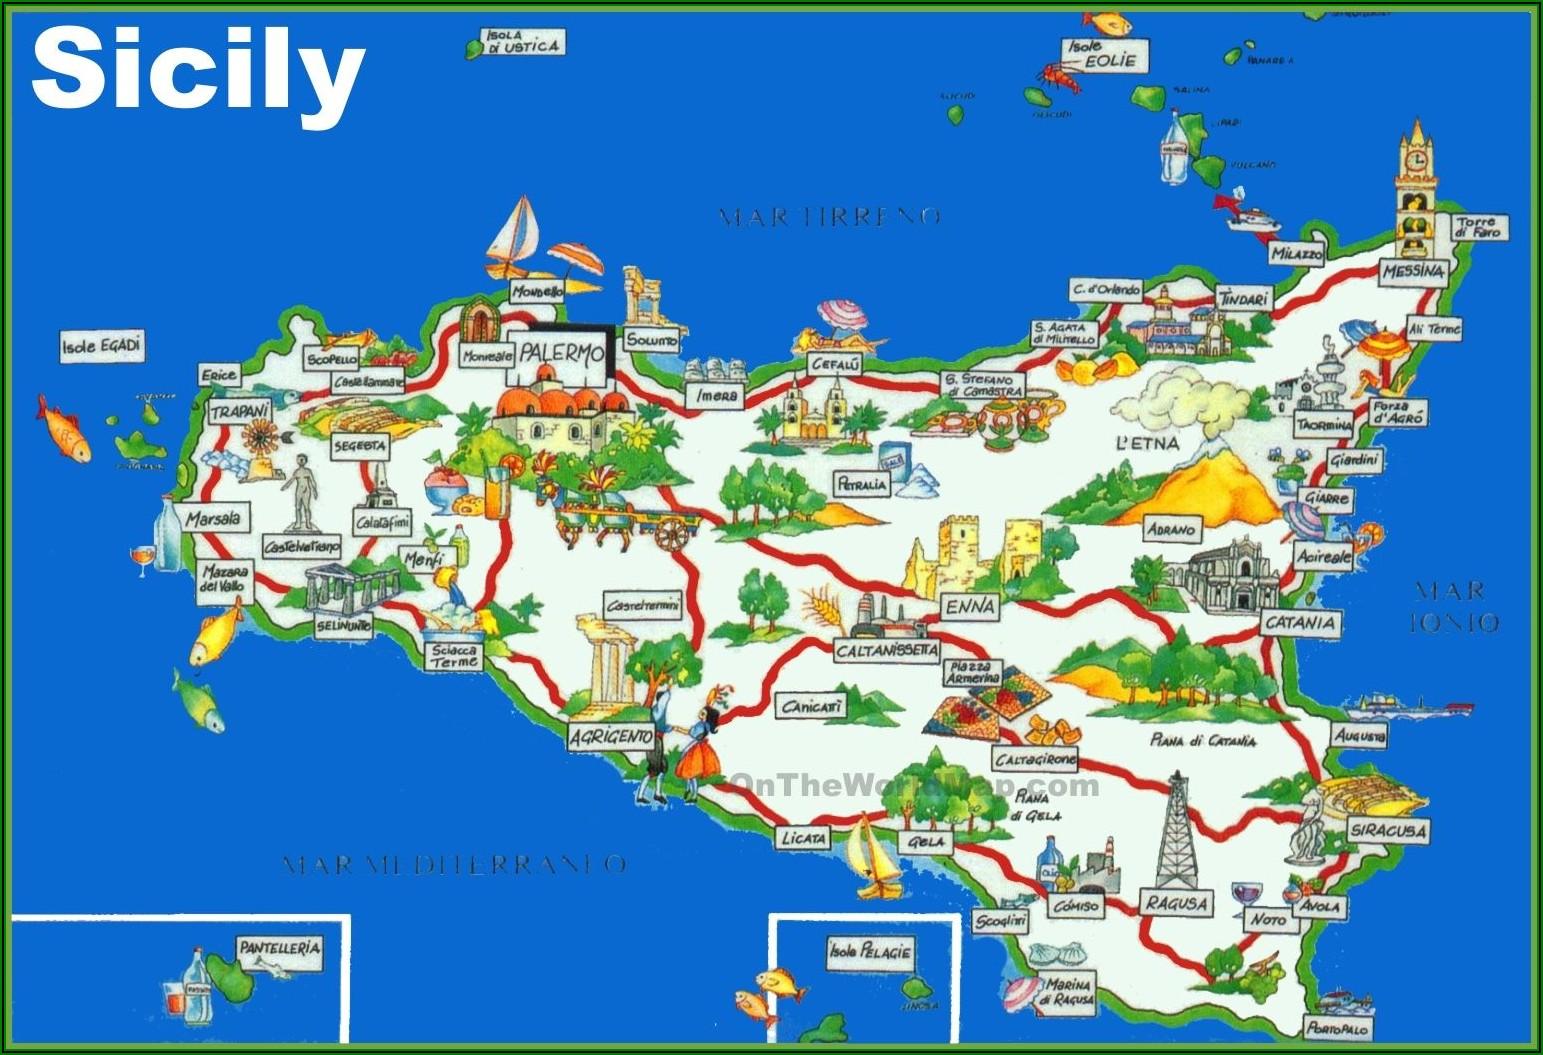 Sicily Tourist Map